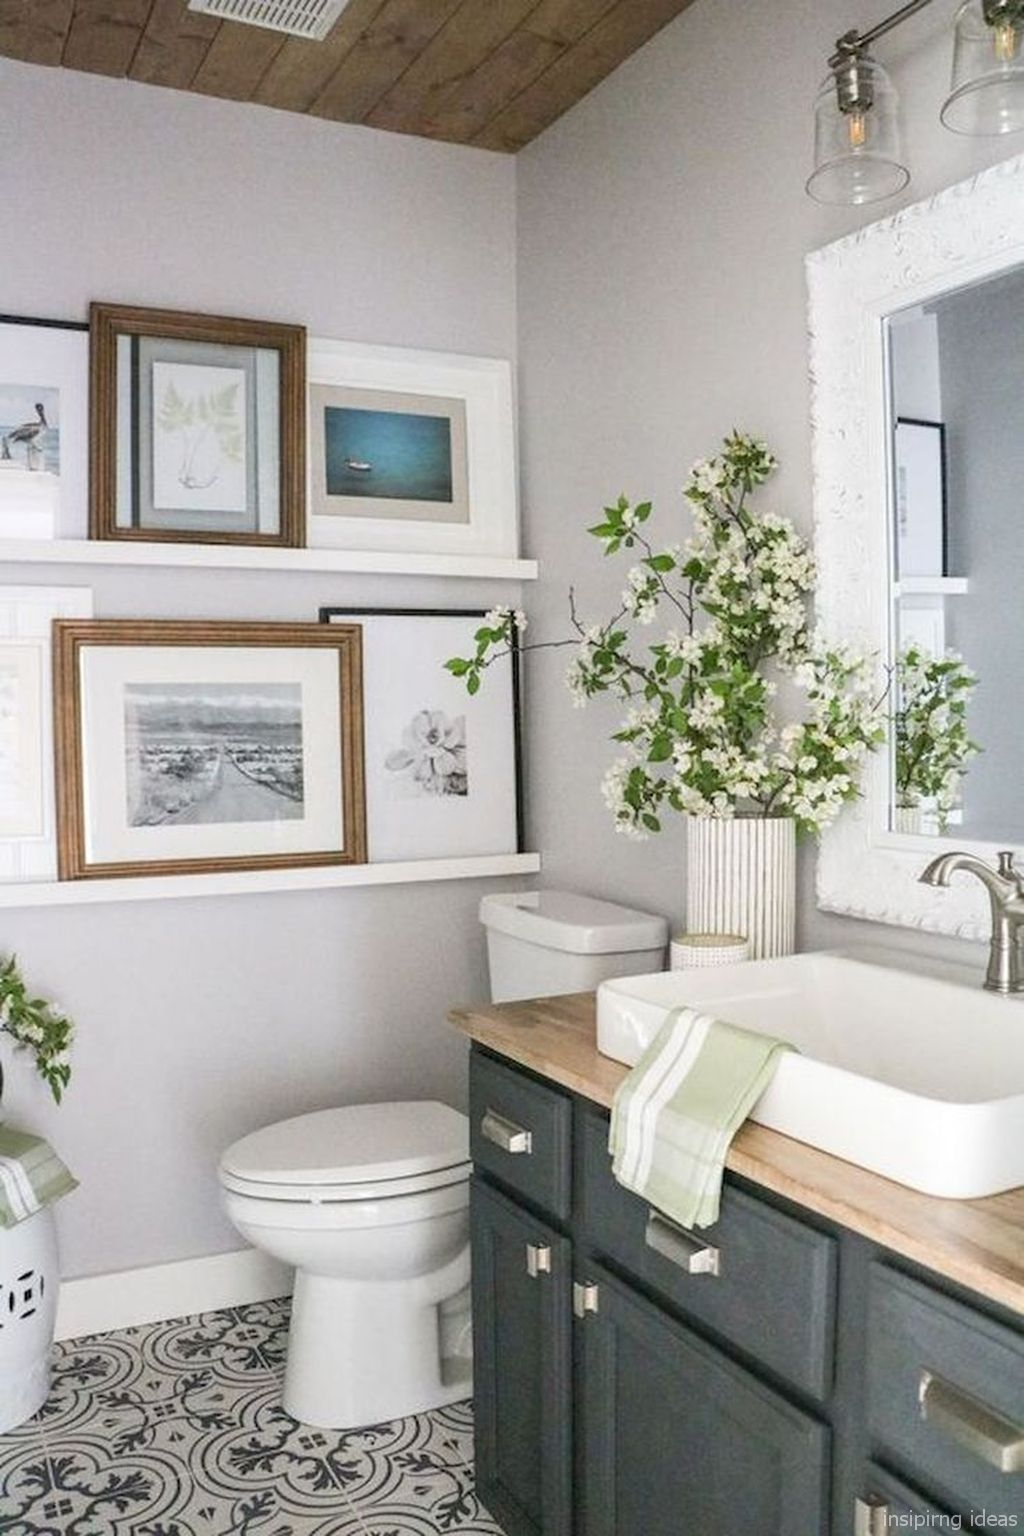 Modern Farmhouse Bathroom for Small Spaces Ideas 30 | Capra Trail ...